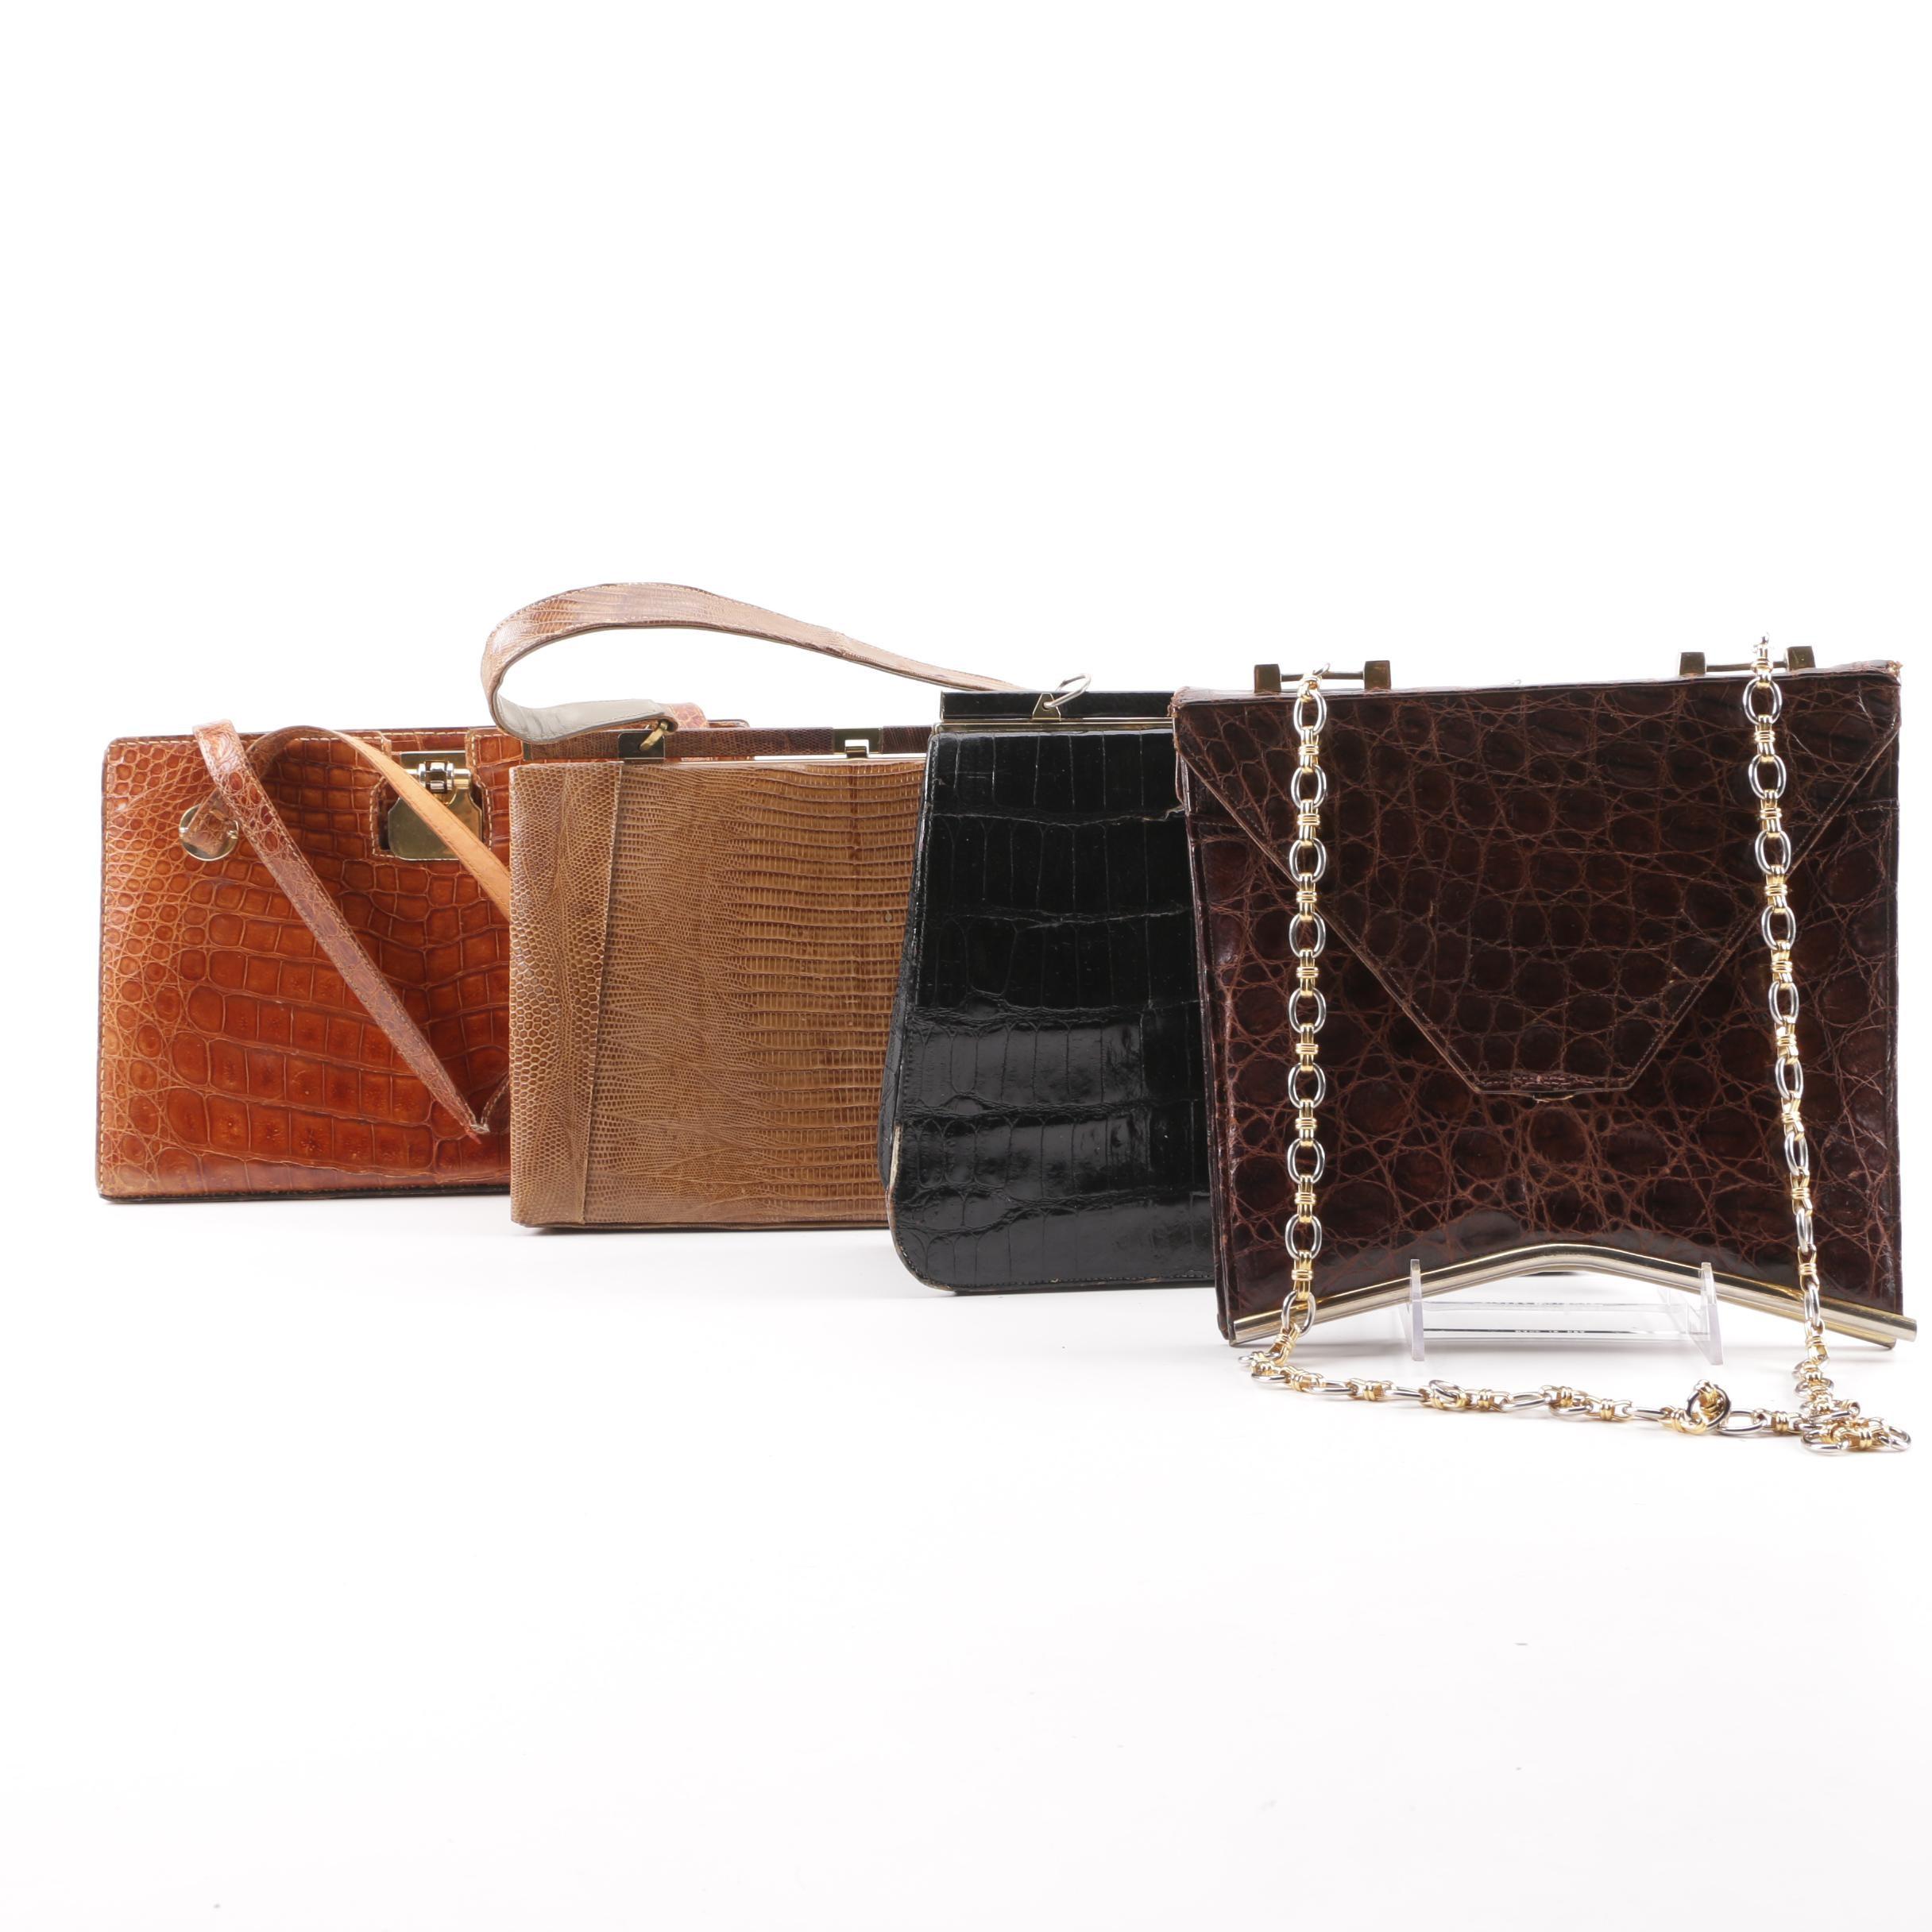 1940s-50s Vintage Lizard, Crocodile and Alligator Skin Handbags